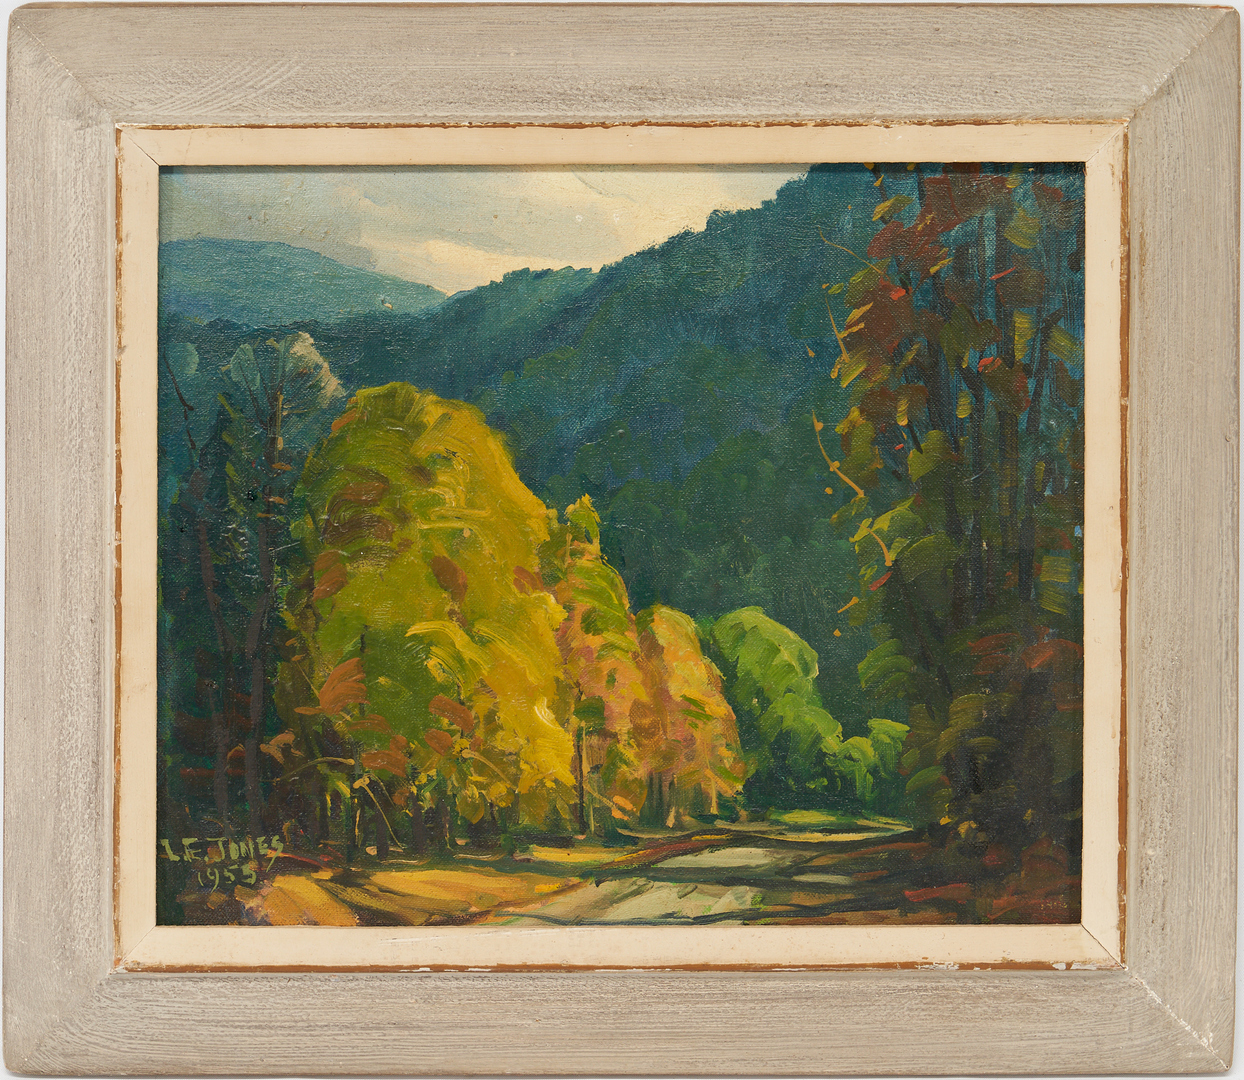 Lot 191: Louis E. Jones O/B Painting, A Burst of Sunlight in the Smokies